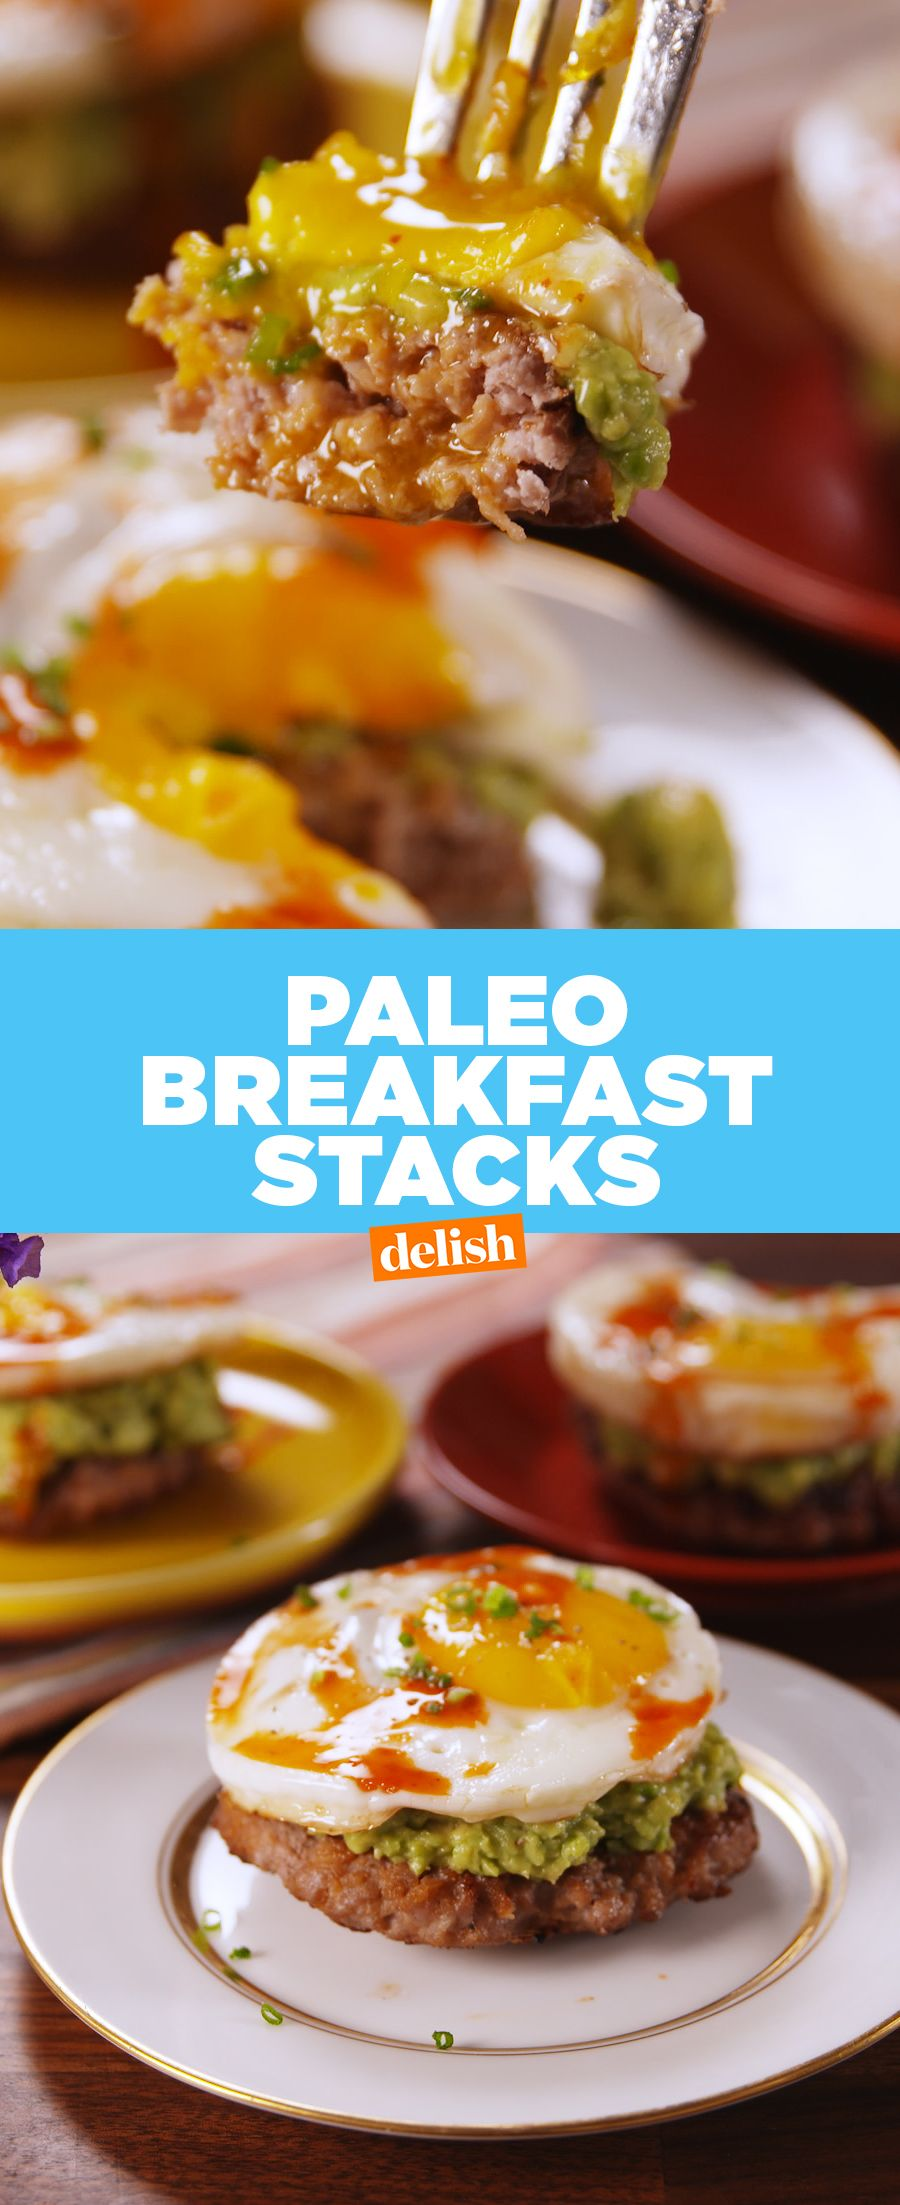 Paleo Breakfast Stacks Start Your Day Off Right Recipe Paleo Breakfast Low Carb Paleo Recipes Recipes